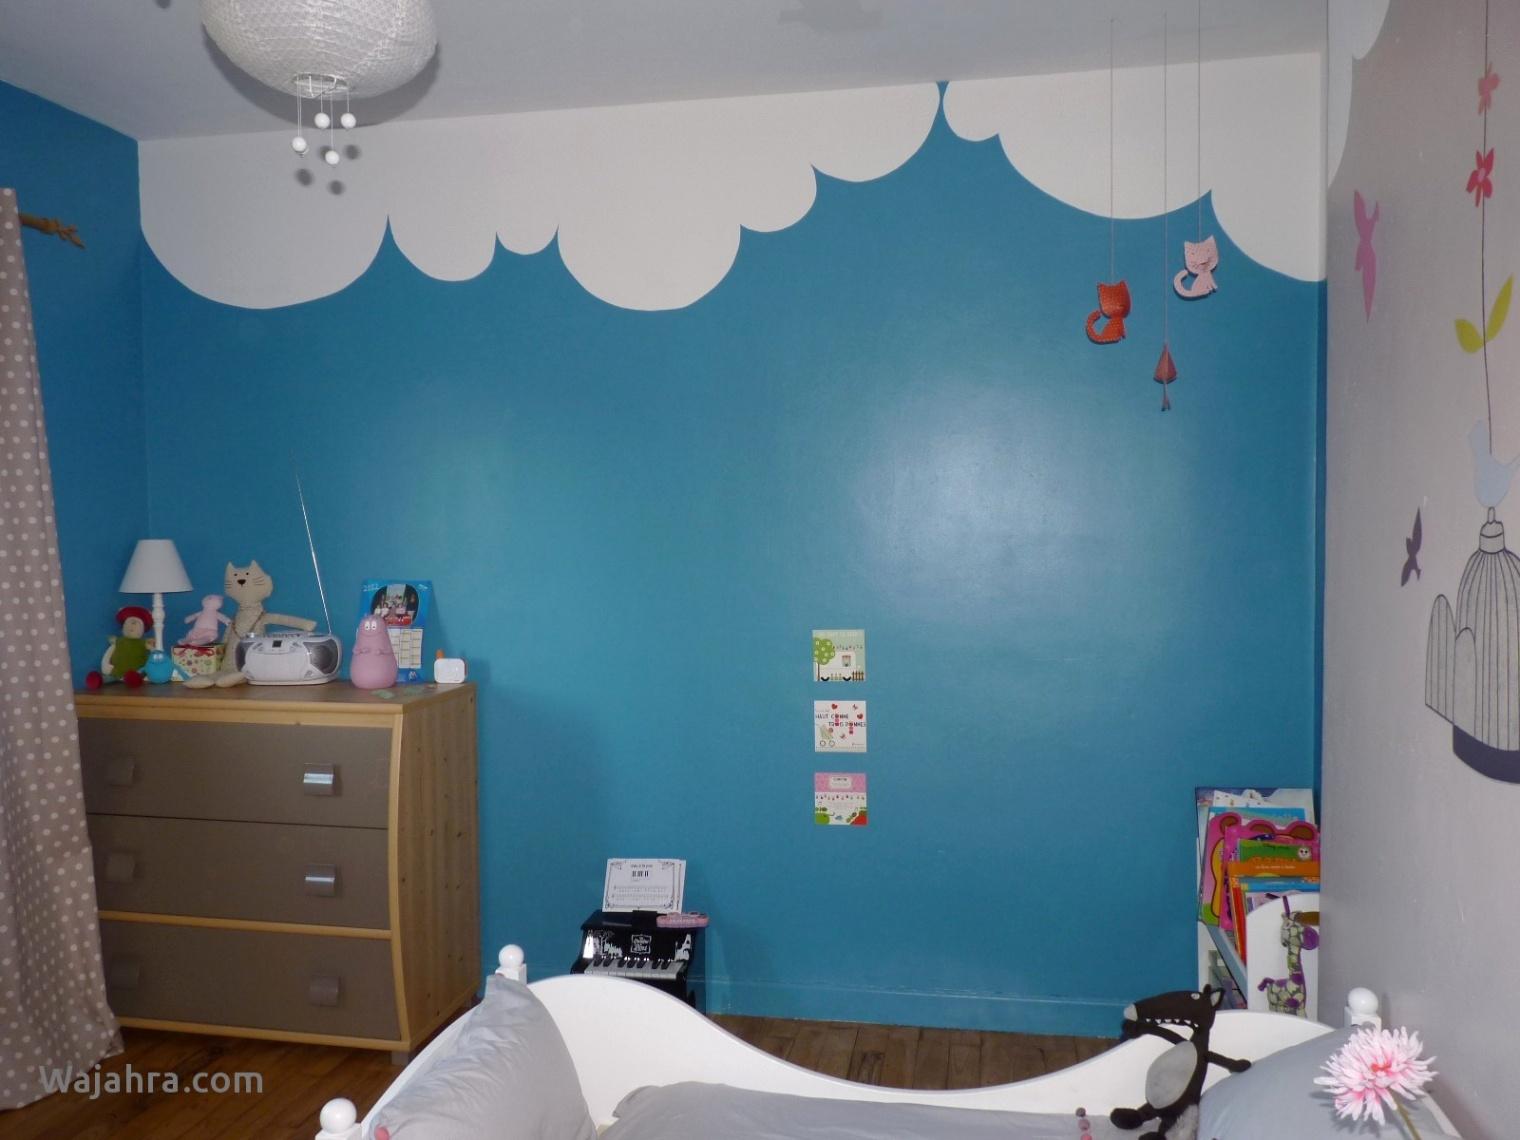 chambre bleu et taupe inspirant chambre bleu enfant tout sur les chambre enfant bleu chambre enfant bleu